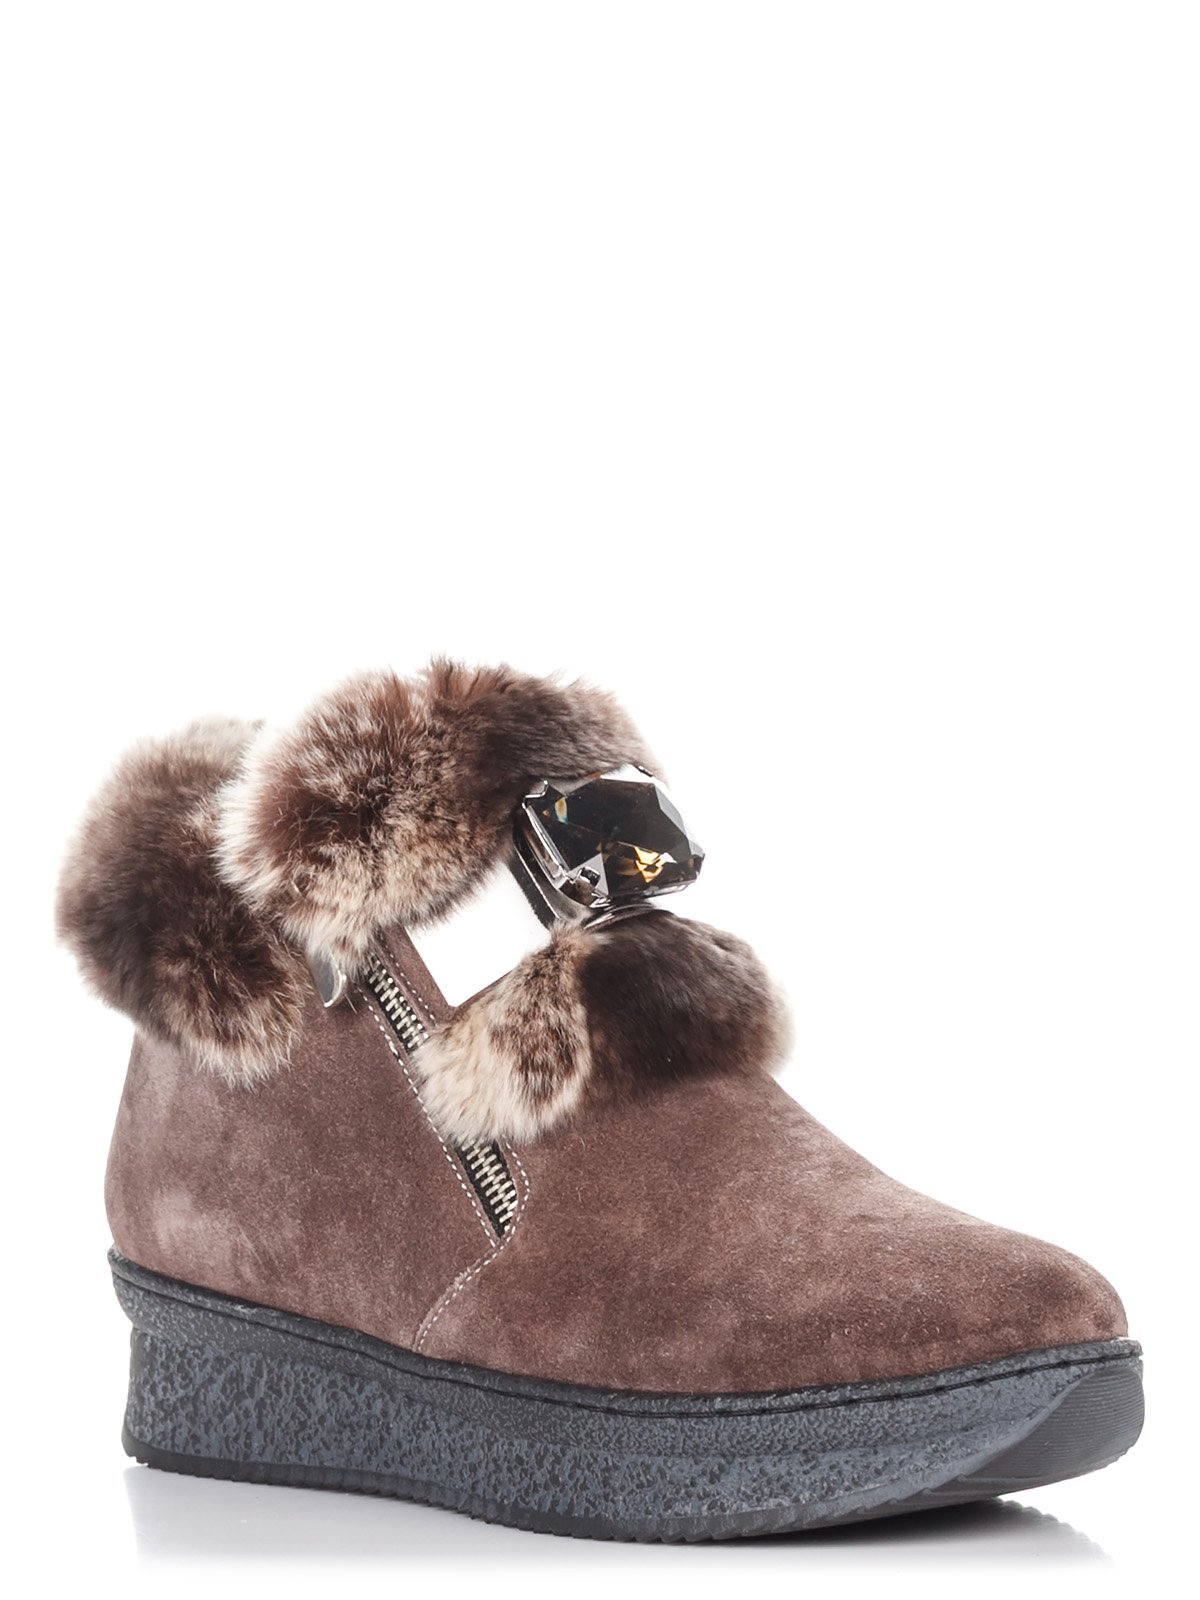 Ботинки коричневые   3713648